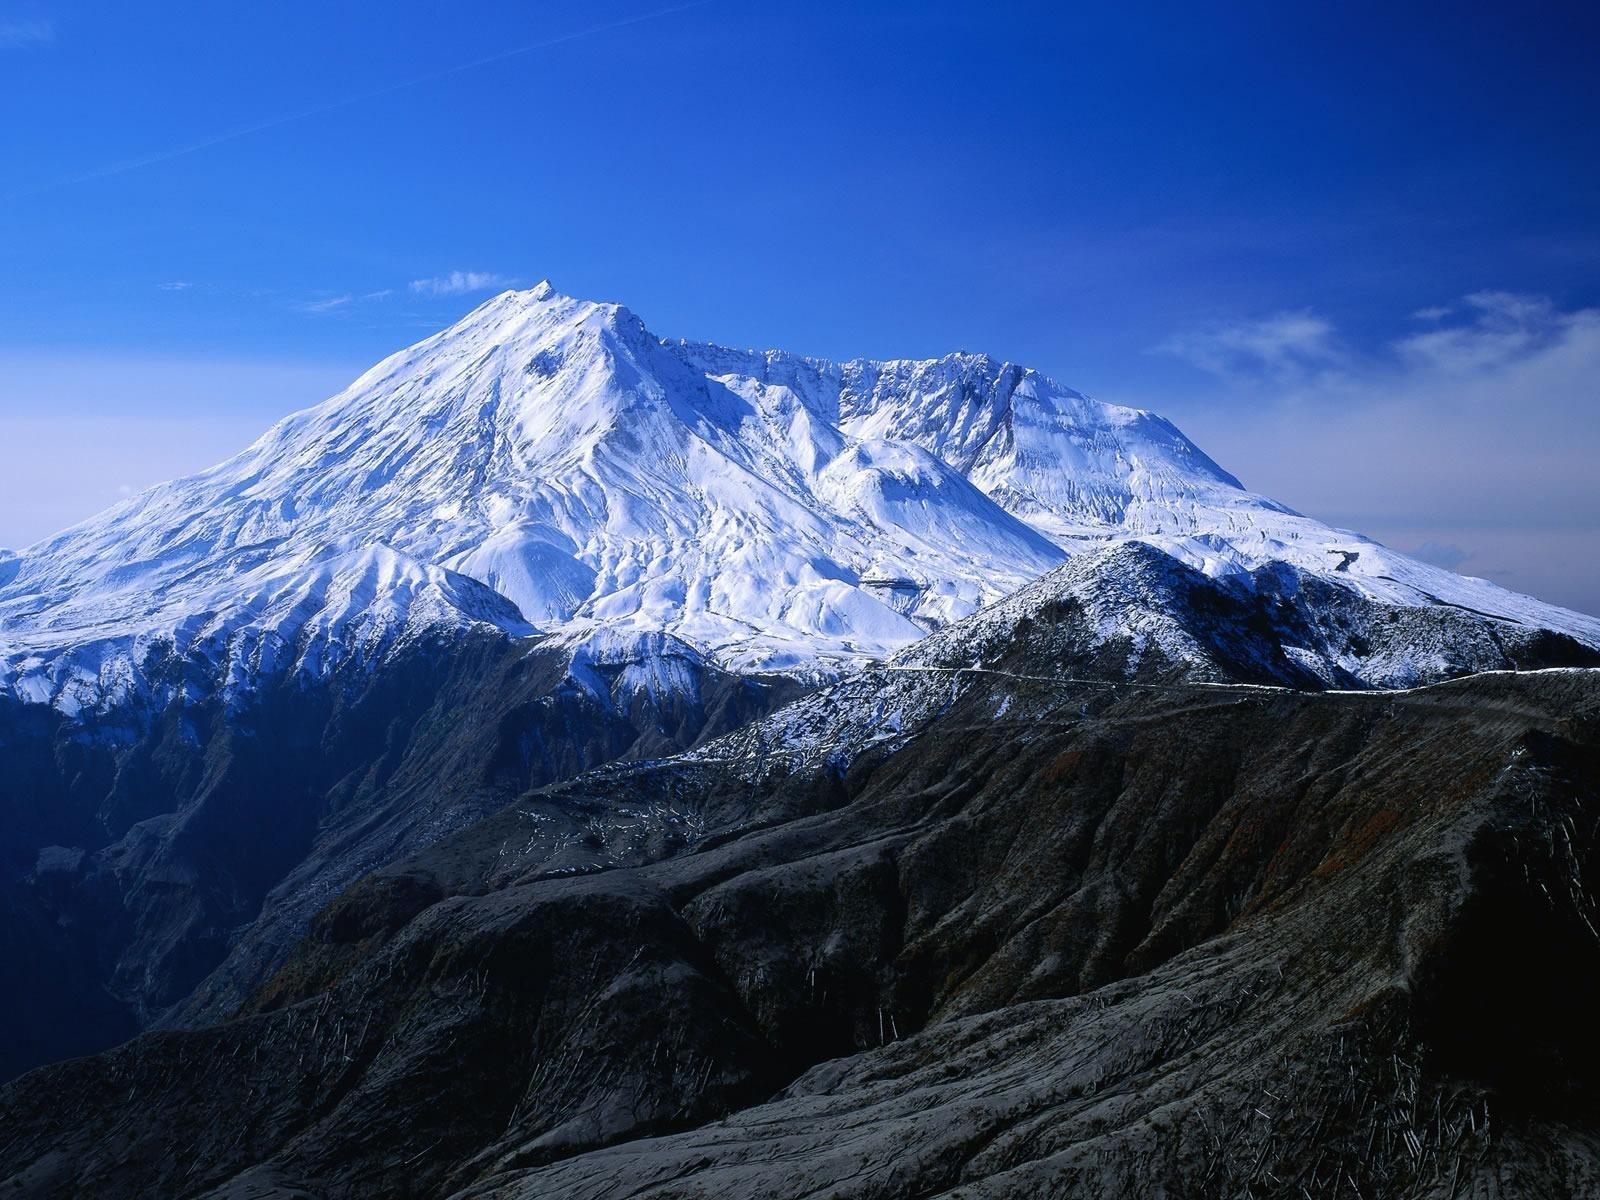 Montaña Nevada 1024x768: Fondos De Pantalla Montañas Coronadas De Nieve, El Cielo